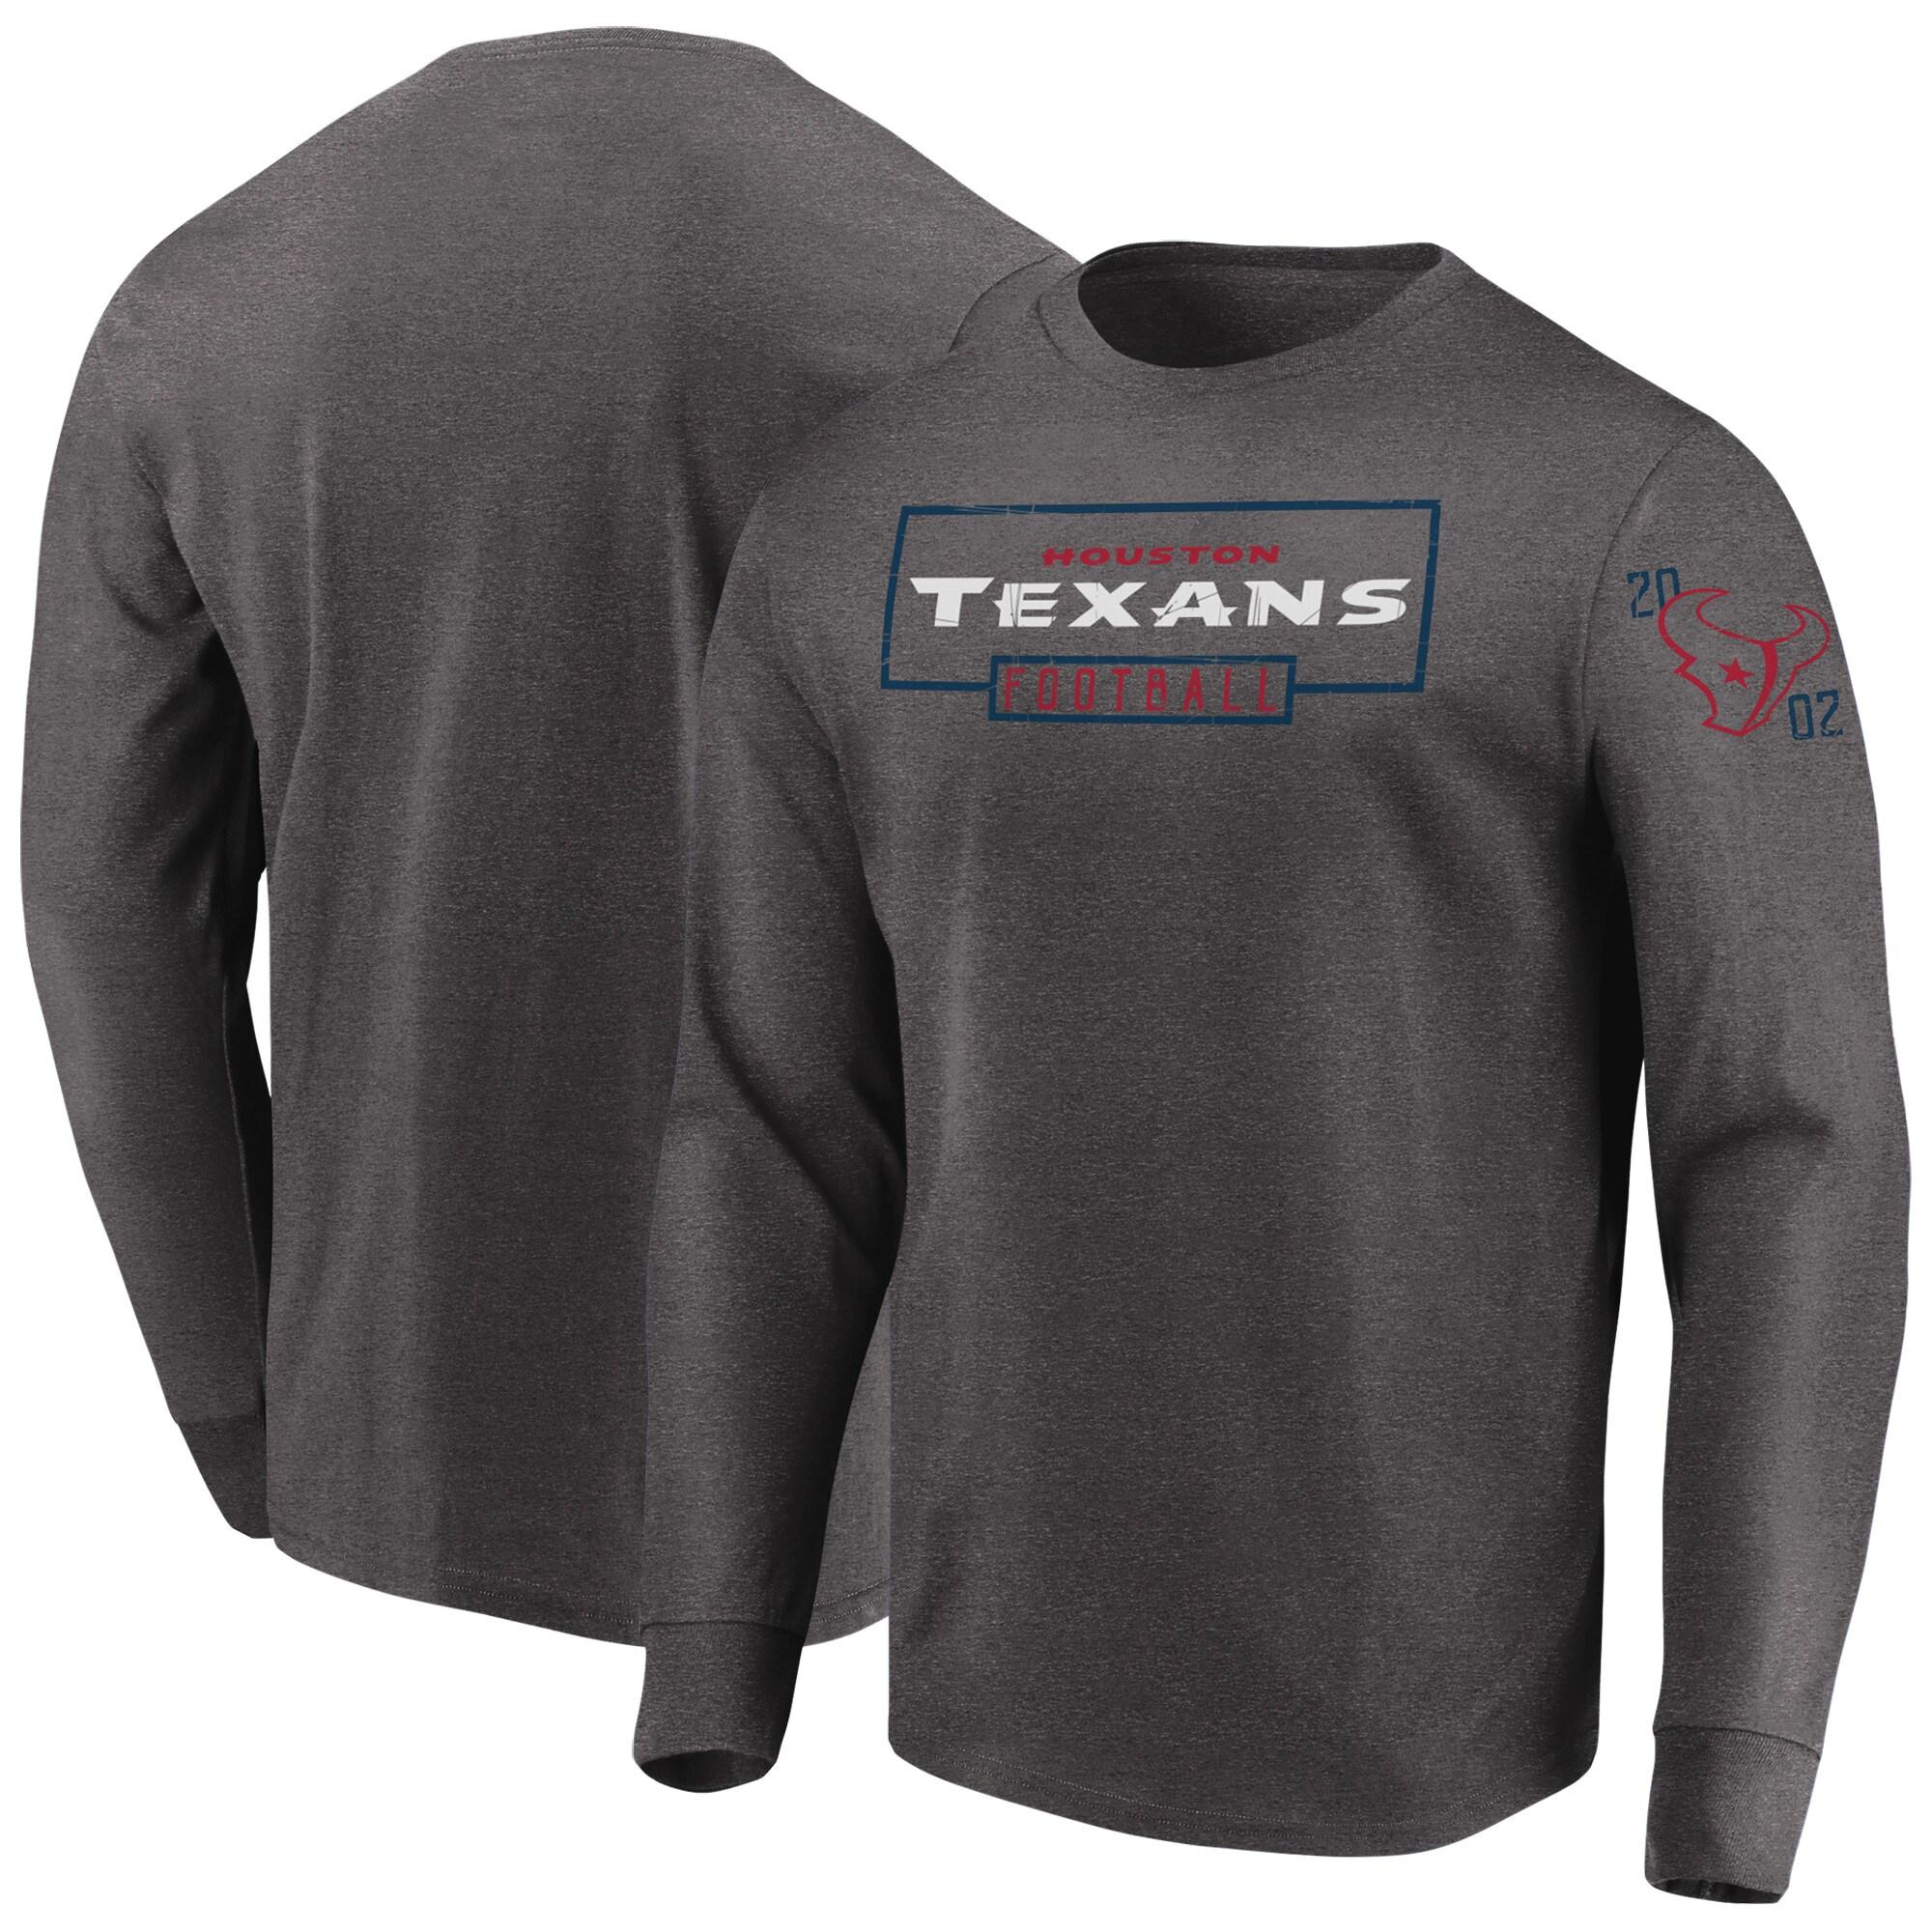 Houston Texans Majestic Kick Return Long Sleeve T-Shirt - Heathered Charcoal